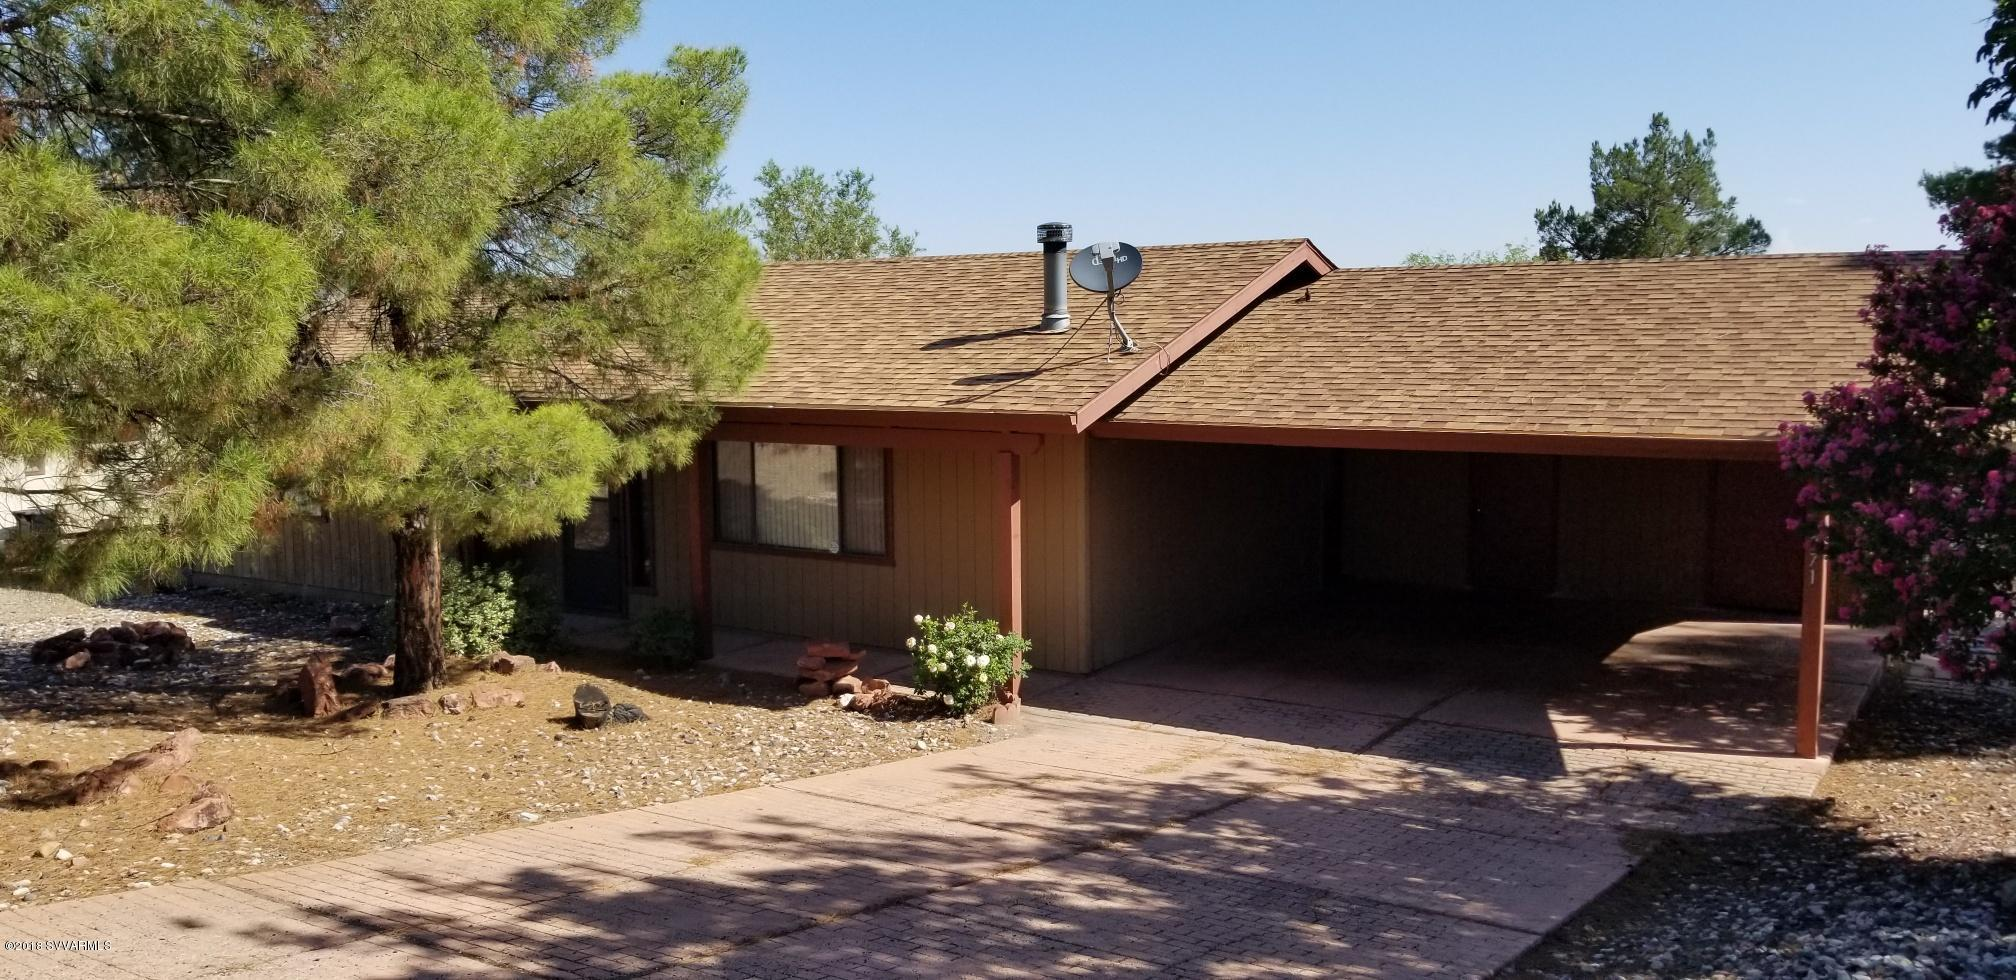 2371 S Lariat Circle Cottonwood, AZ 86326